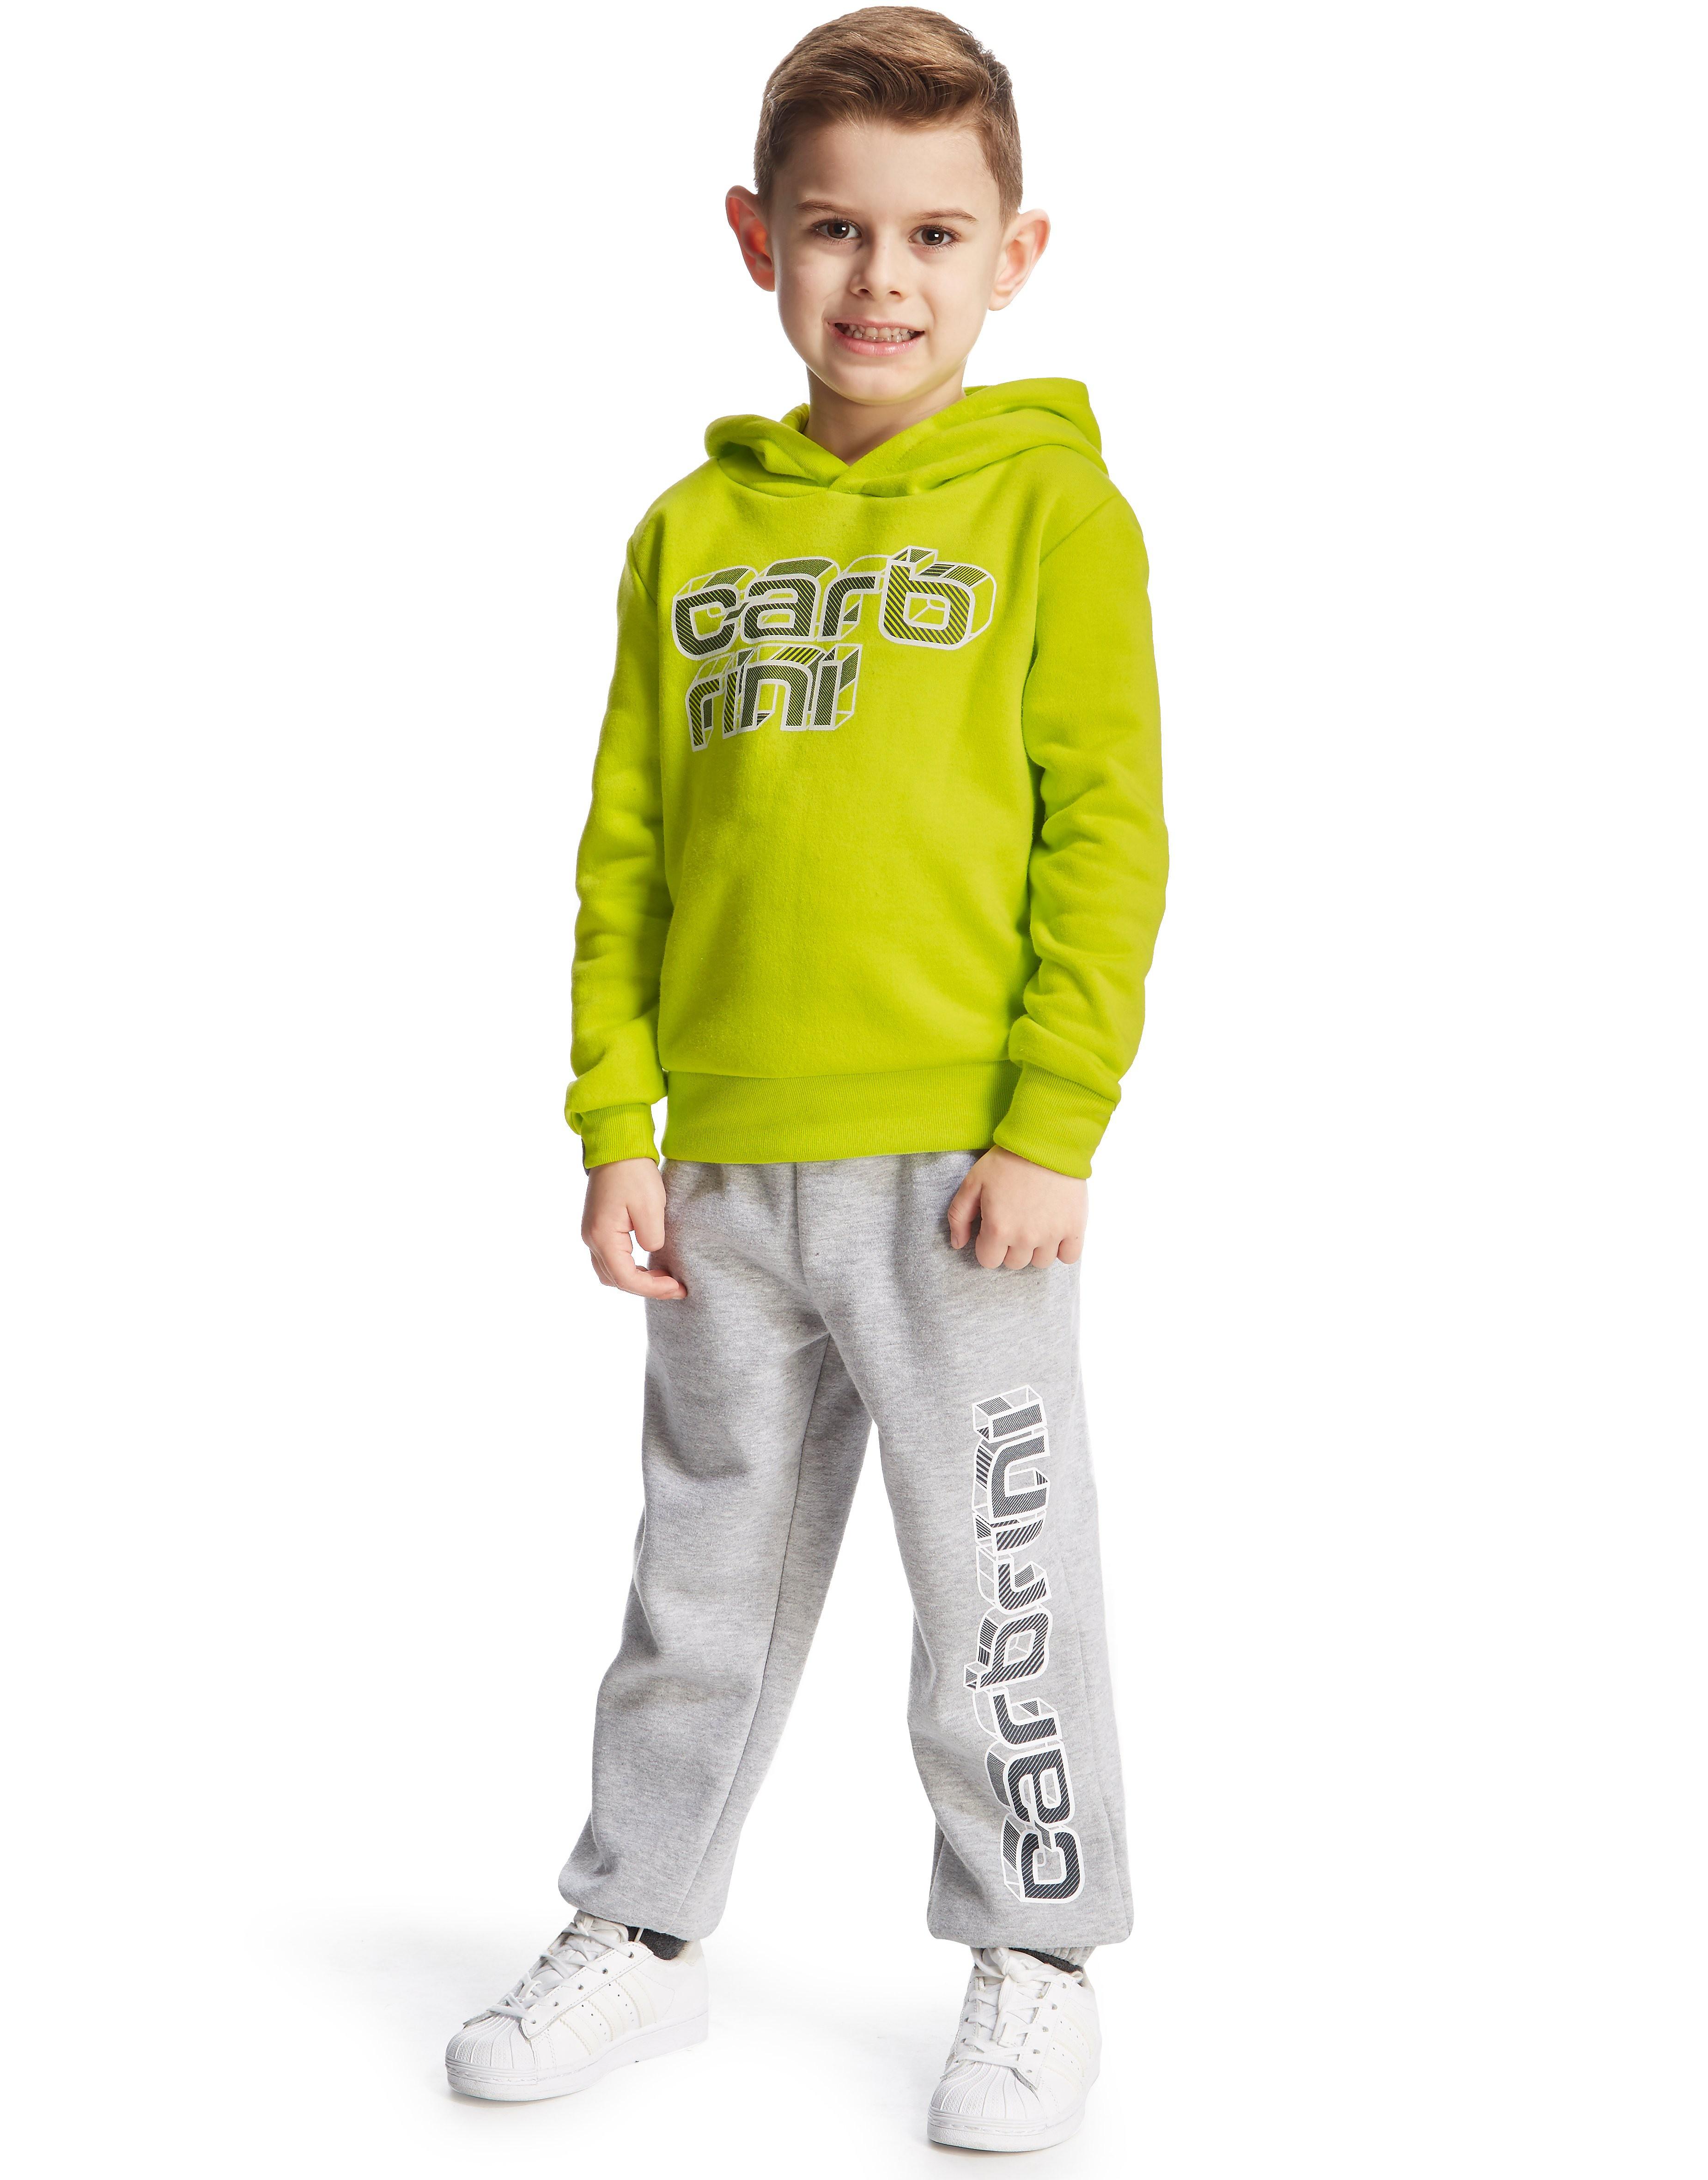 Carbrini Scuba Suit Children